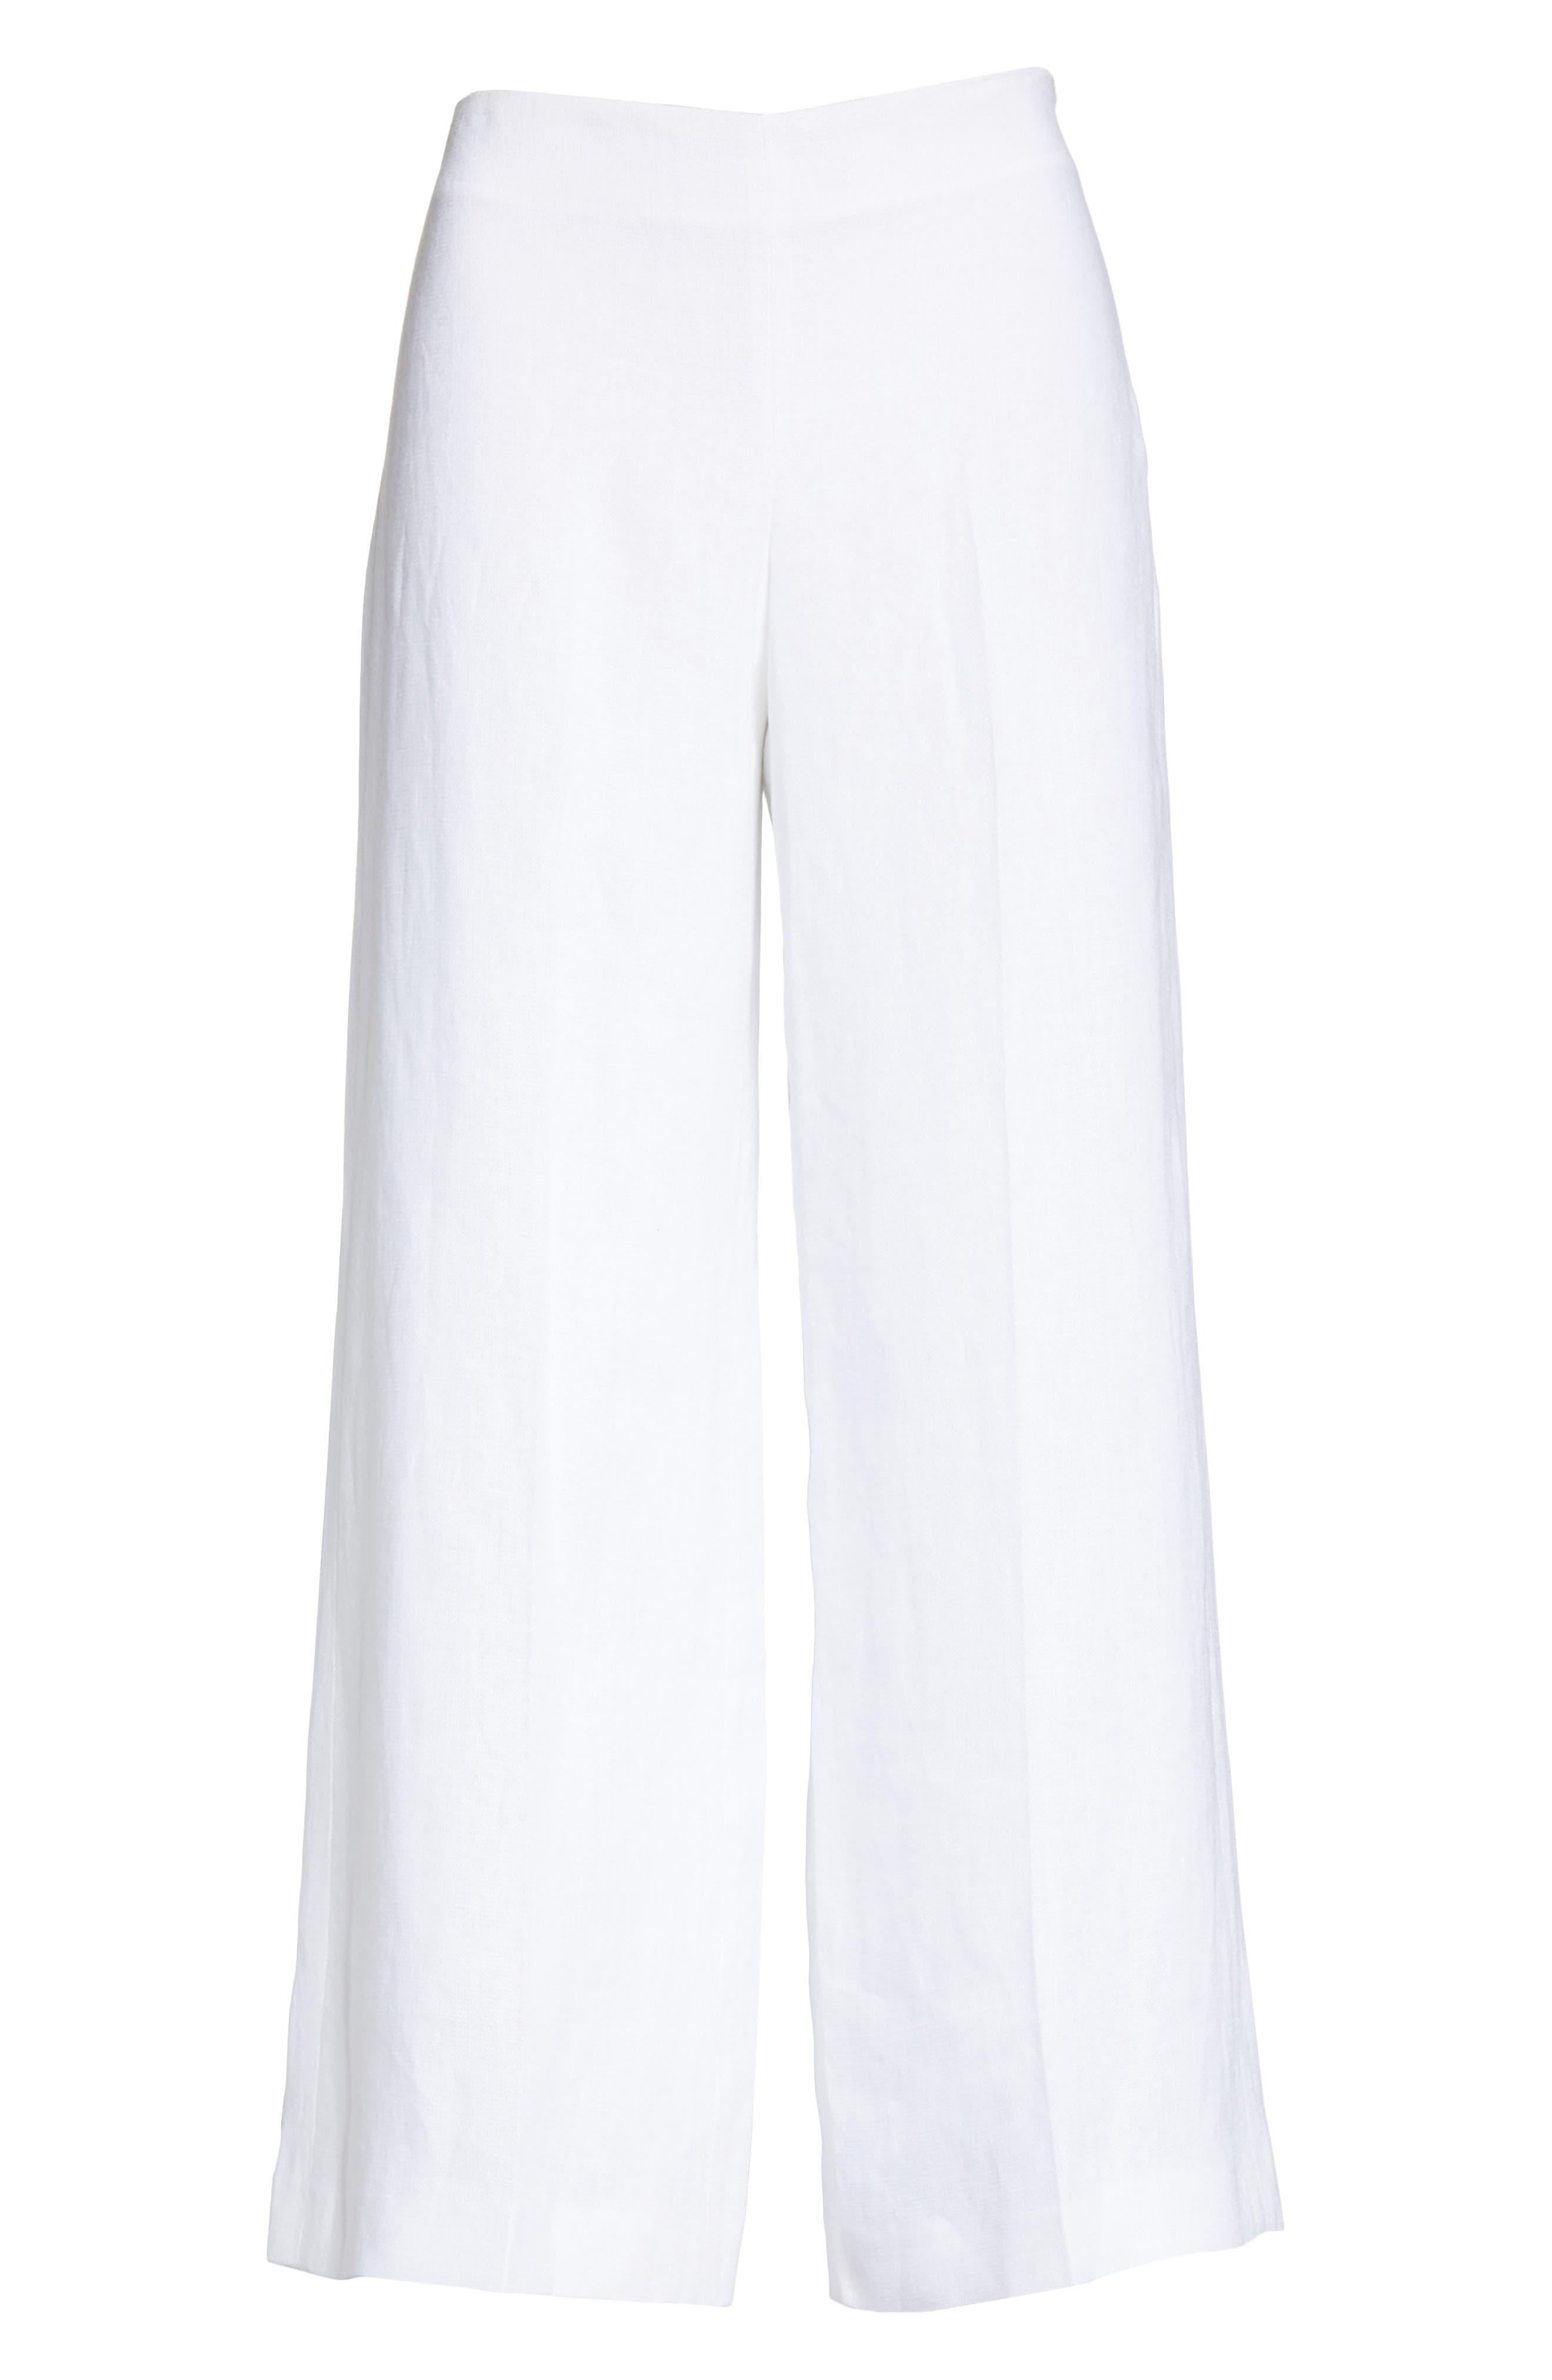 Terena B Linen Wide Leg Pants,                             Alternate thumbnail 6, color,                             White